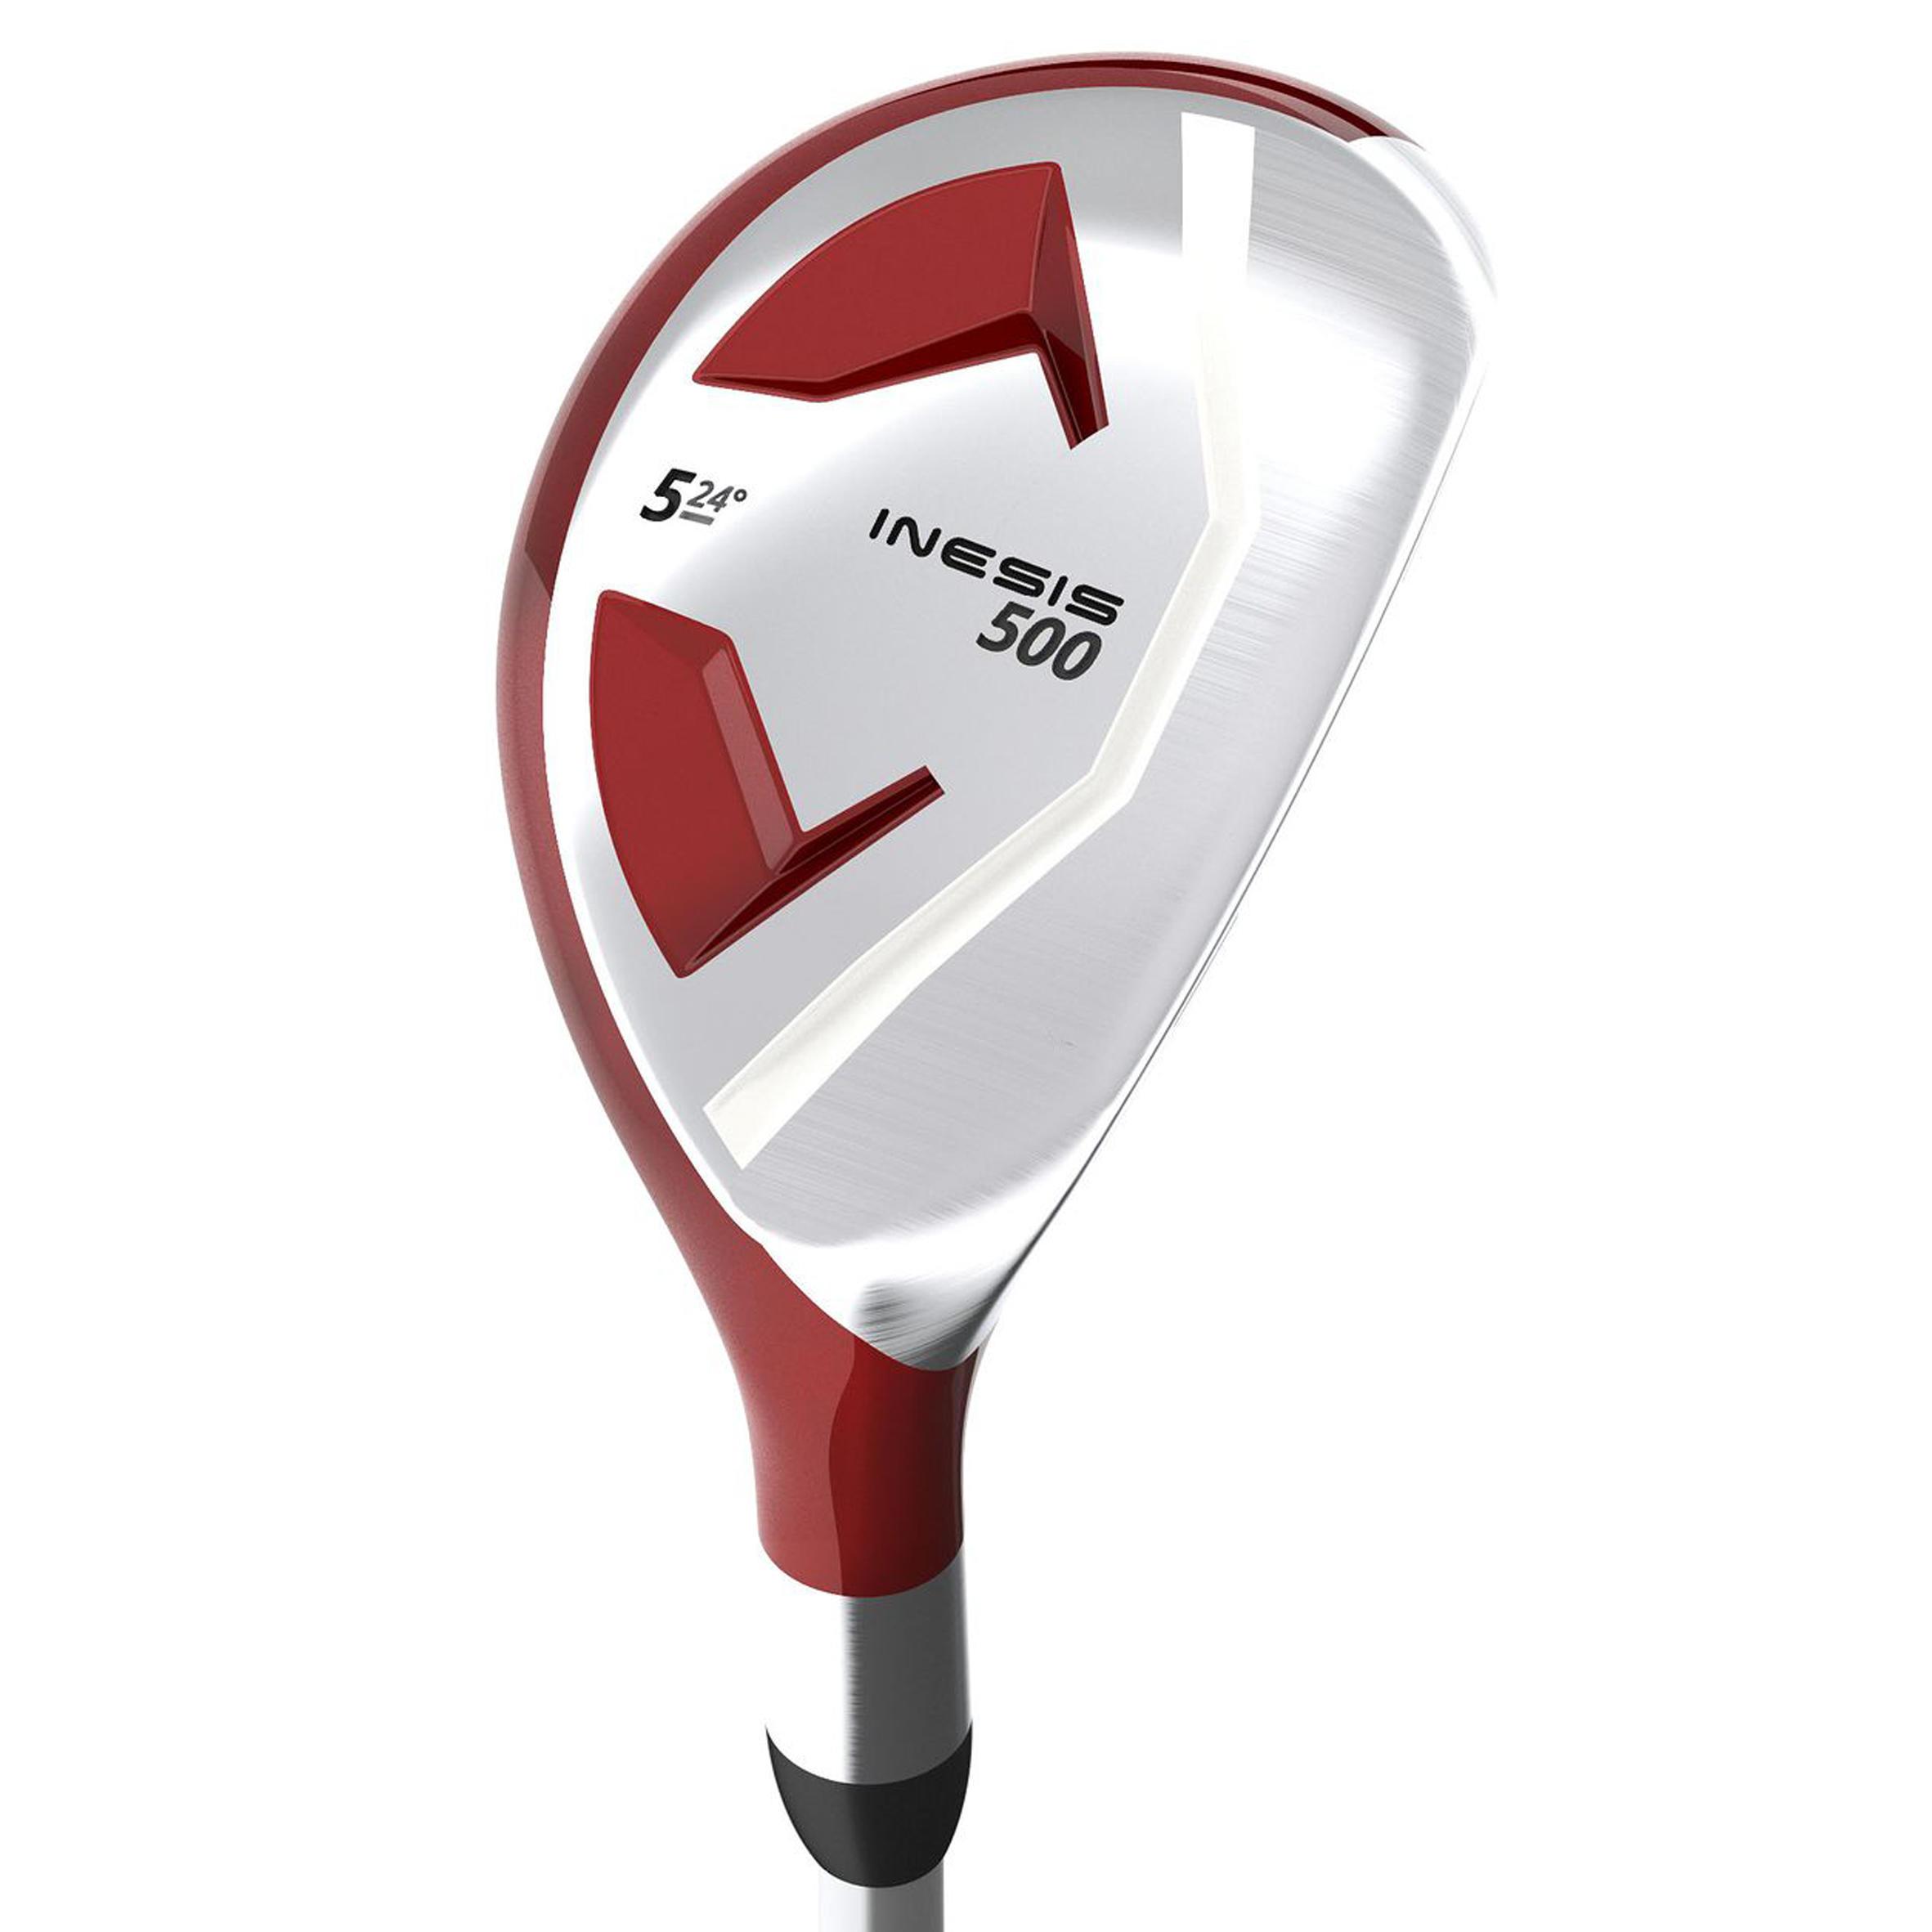 Kids Golf 5-Hybrid 500 - 8-10 yrs Right Hander